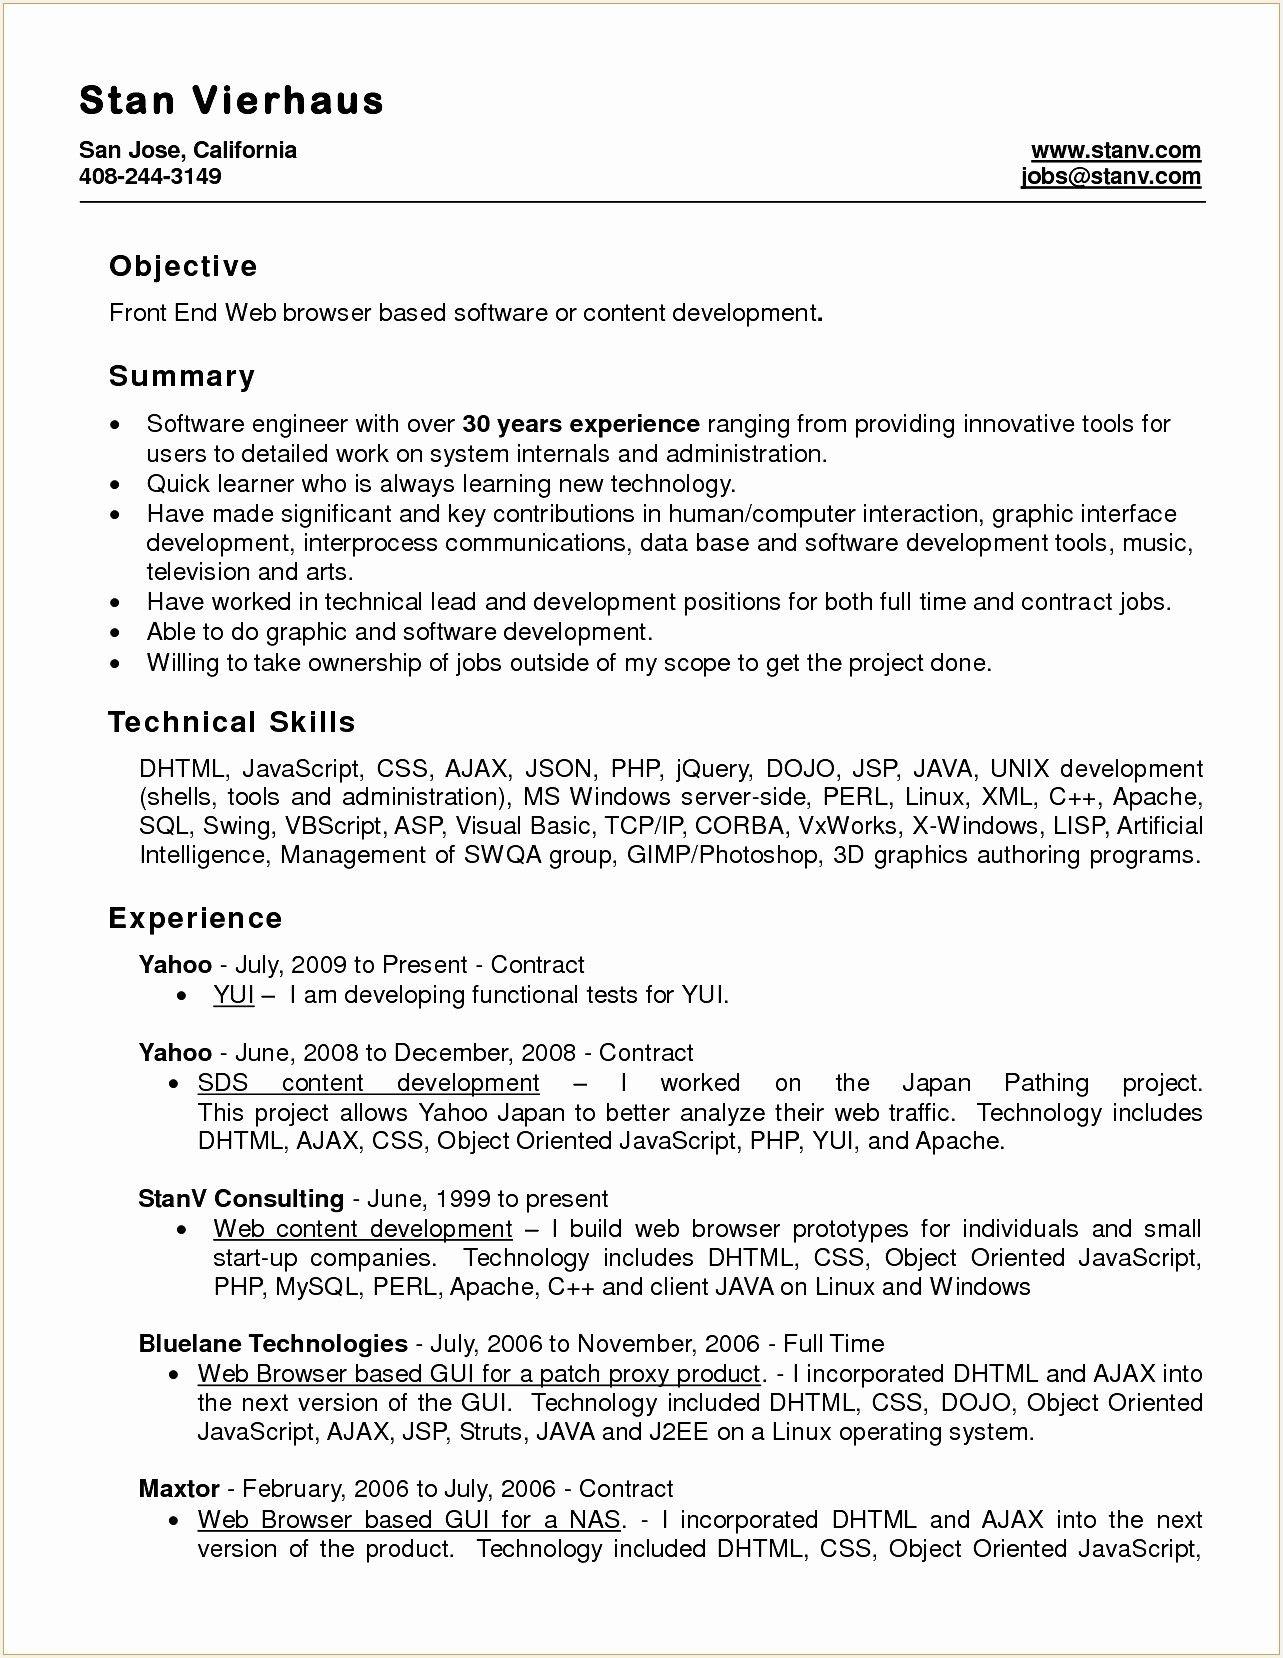 Resume Template Reddit This Is How Resume Template Reddit Will Look Like In 1 Years Time Teacher Resume Template Resume Template Word Student Resume Template